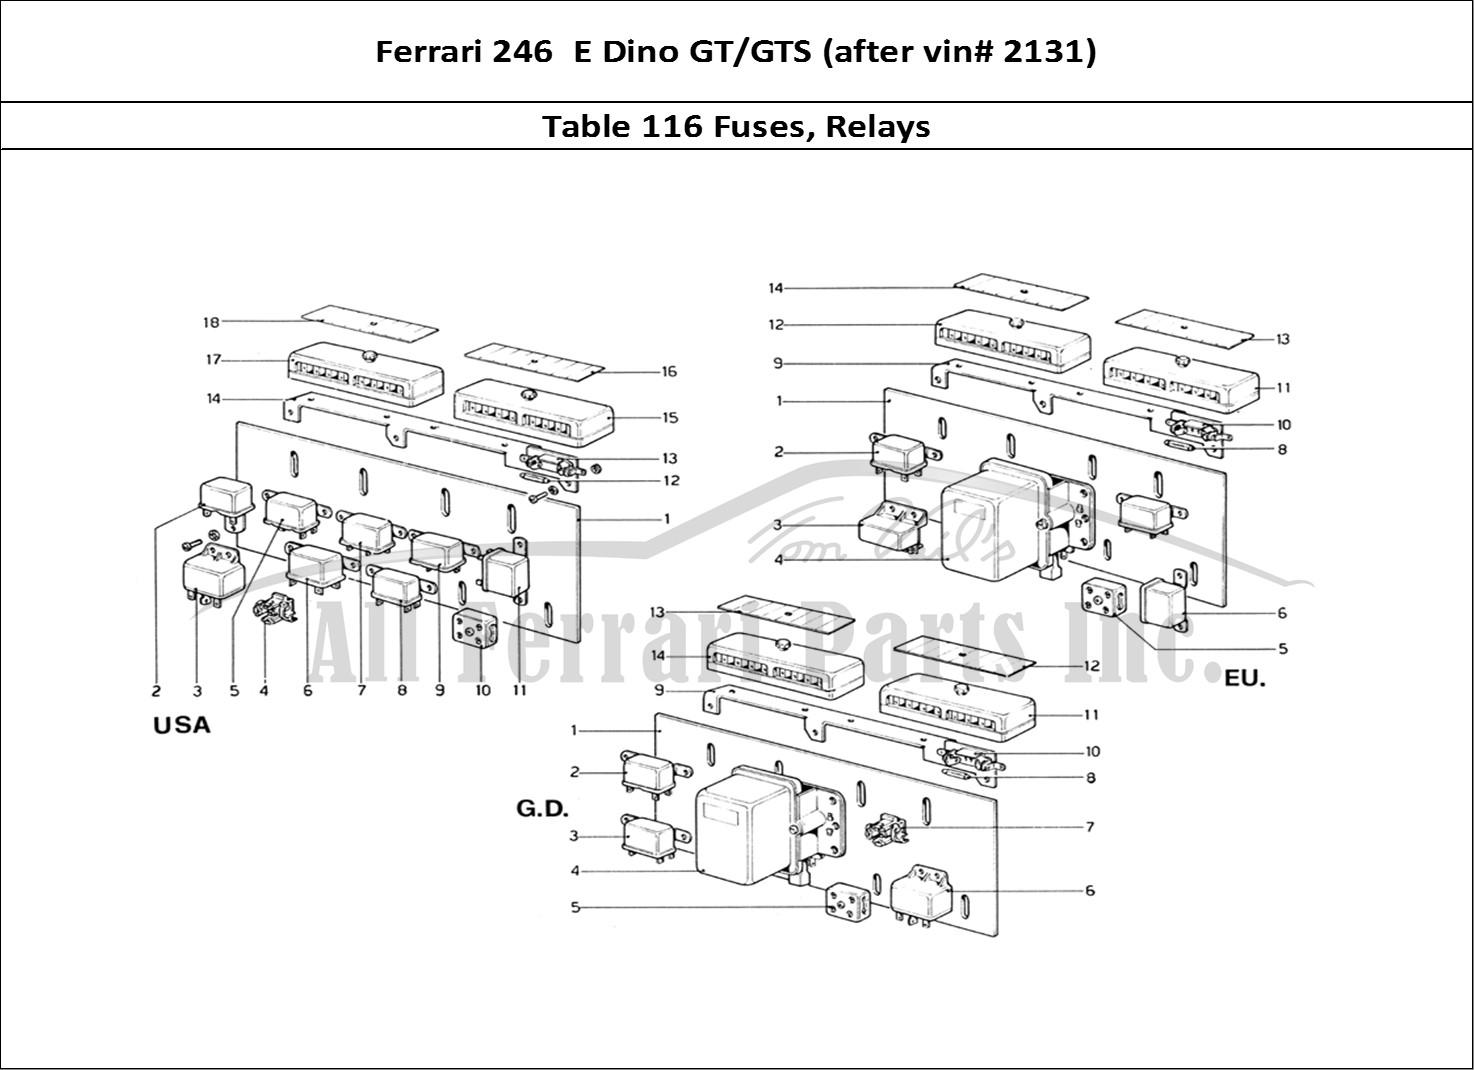 Buy Original Ferrari 246 E Dino Gt Gts After Vin 2131 116 Fuses 308 Fuse Box Bodywork Table Relays